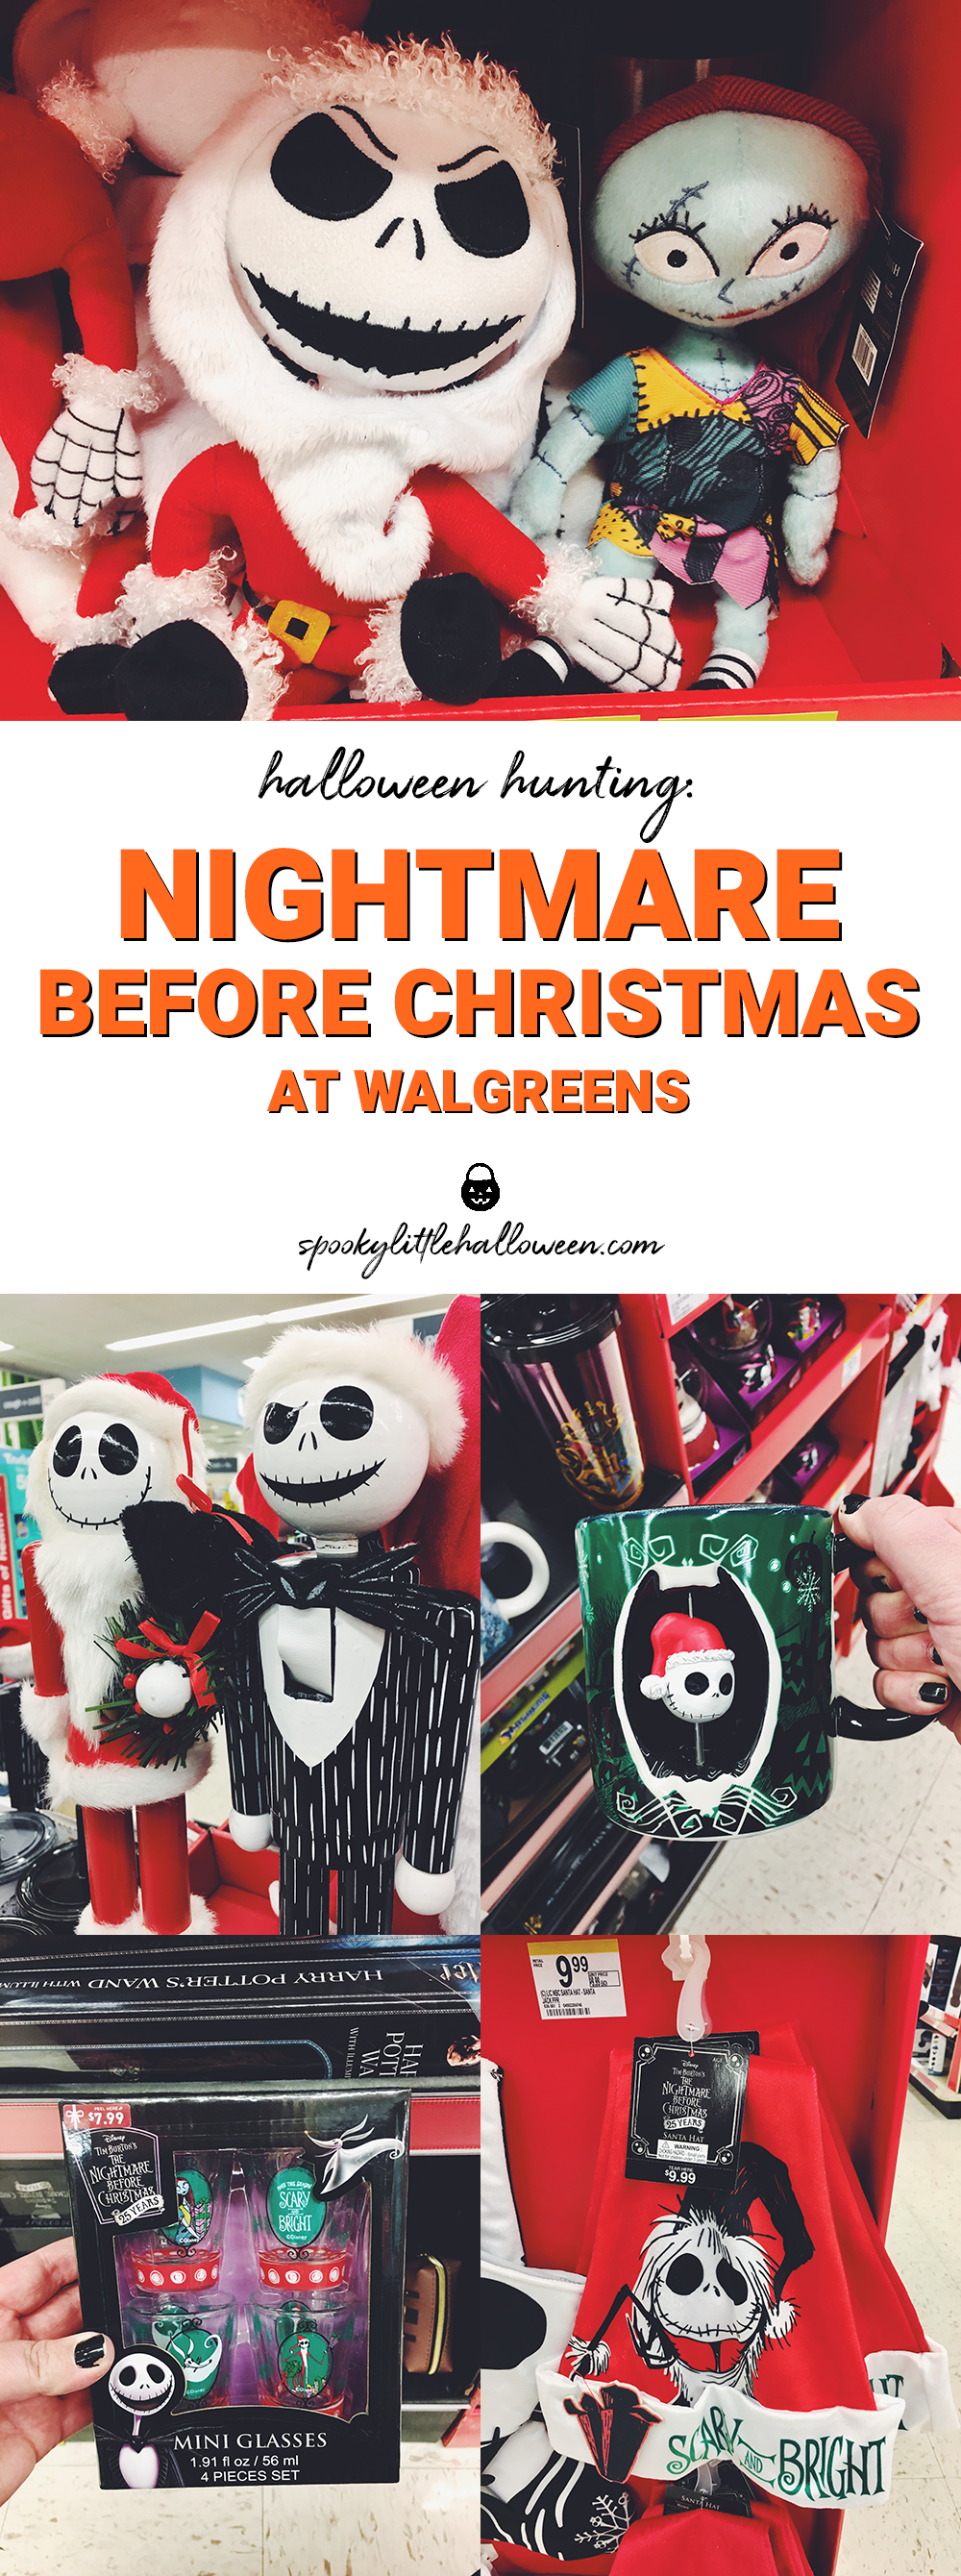 Halloween Hunting: Nightmare Before Christmas at Walgreens - Spooky ...